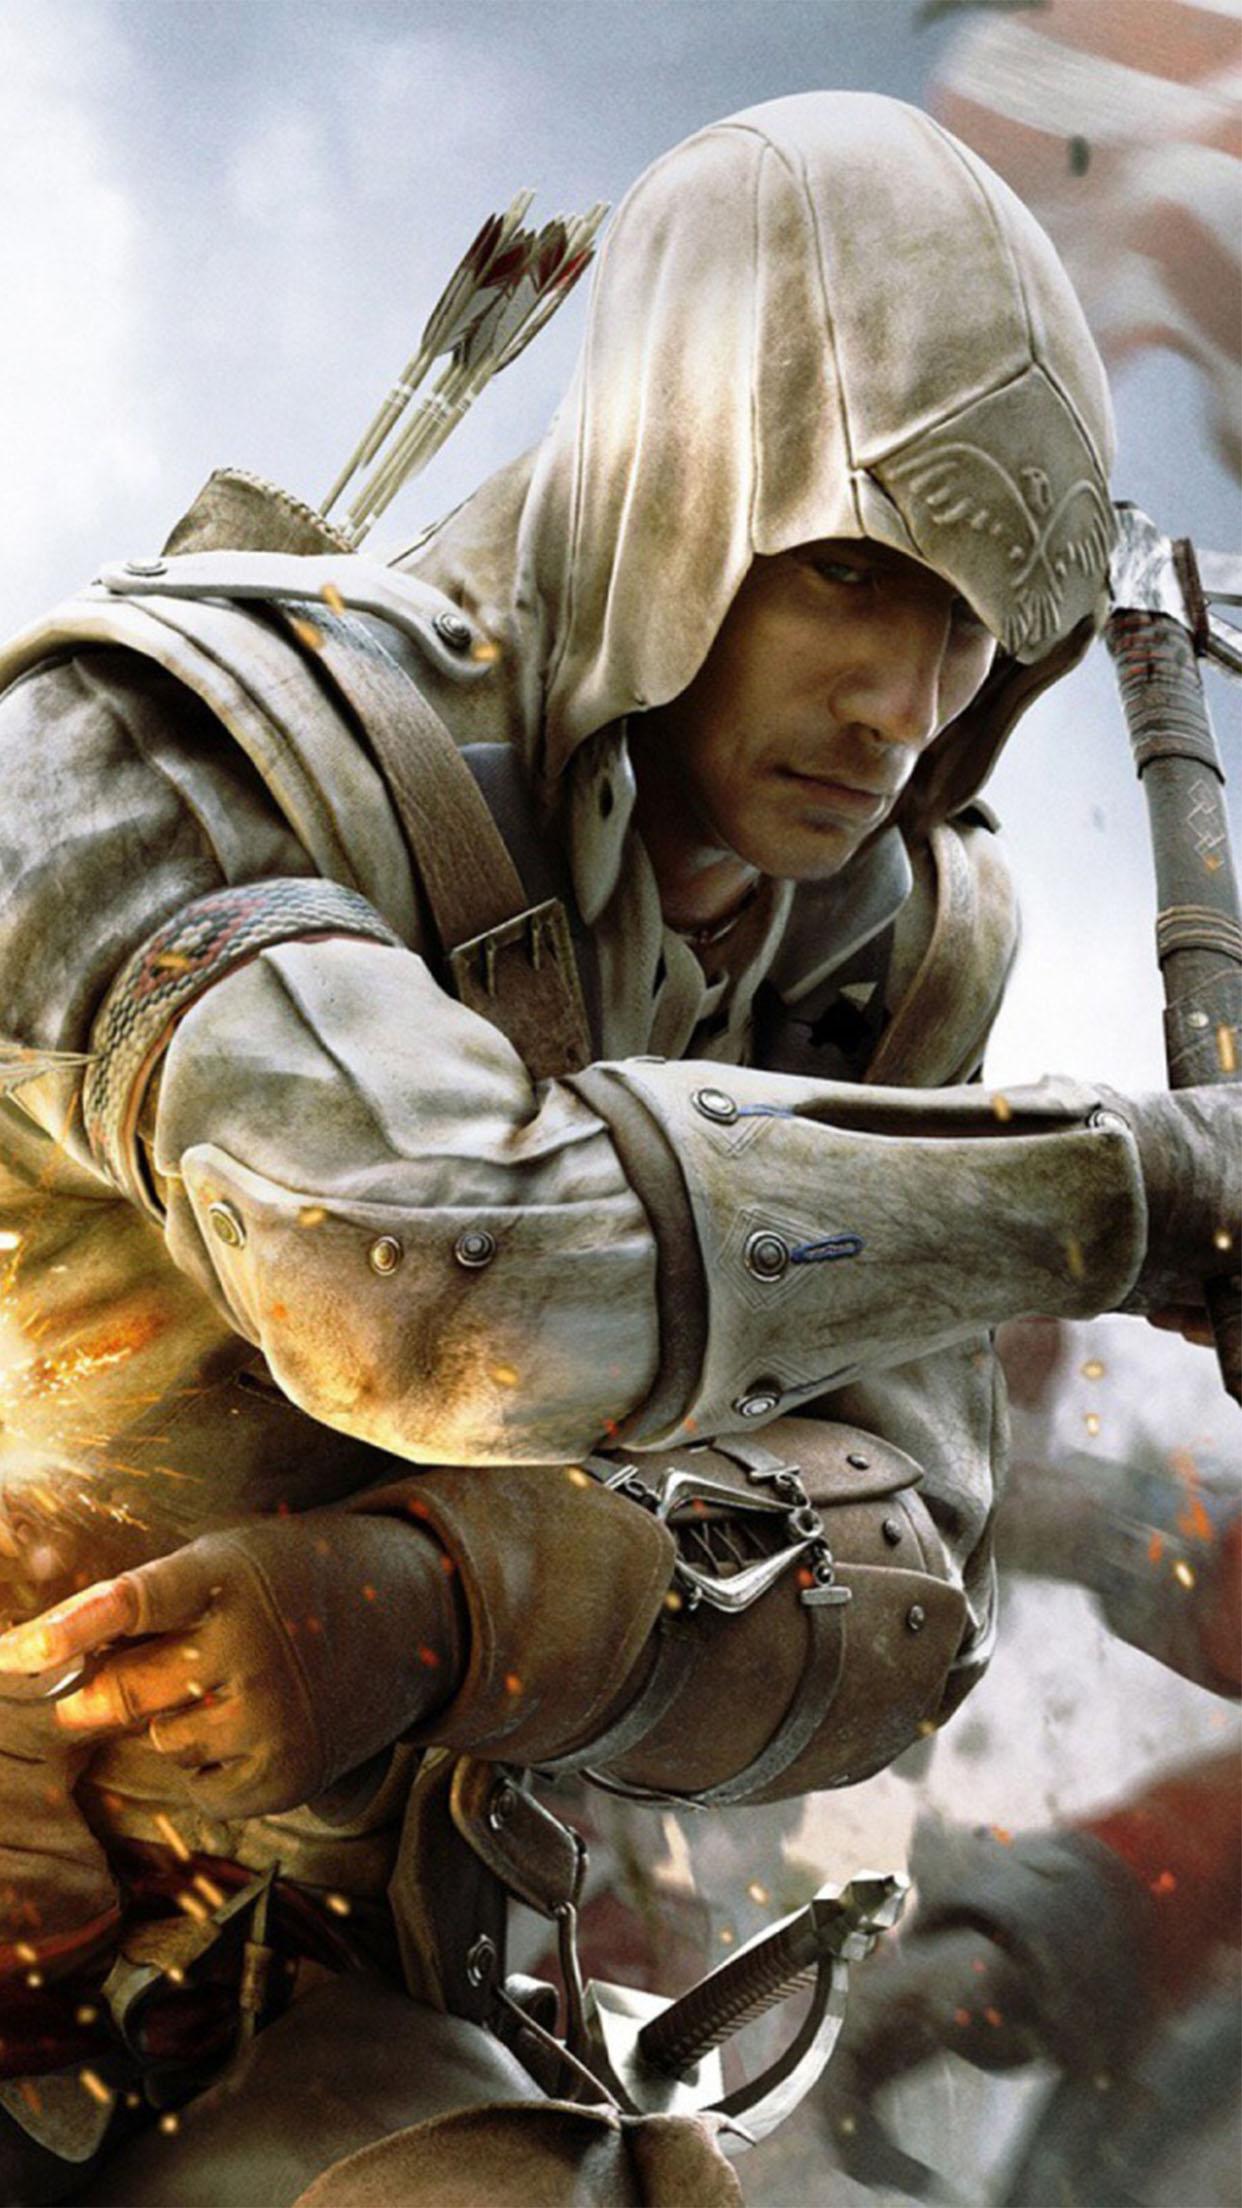 Assasins Creed Assassins Creed 3 3Wallpapers iPhone Parallax Assassins Creed 3